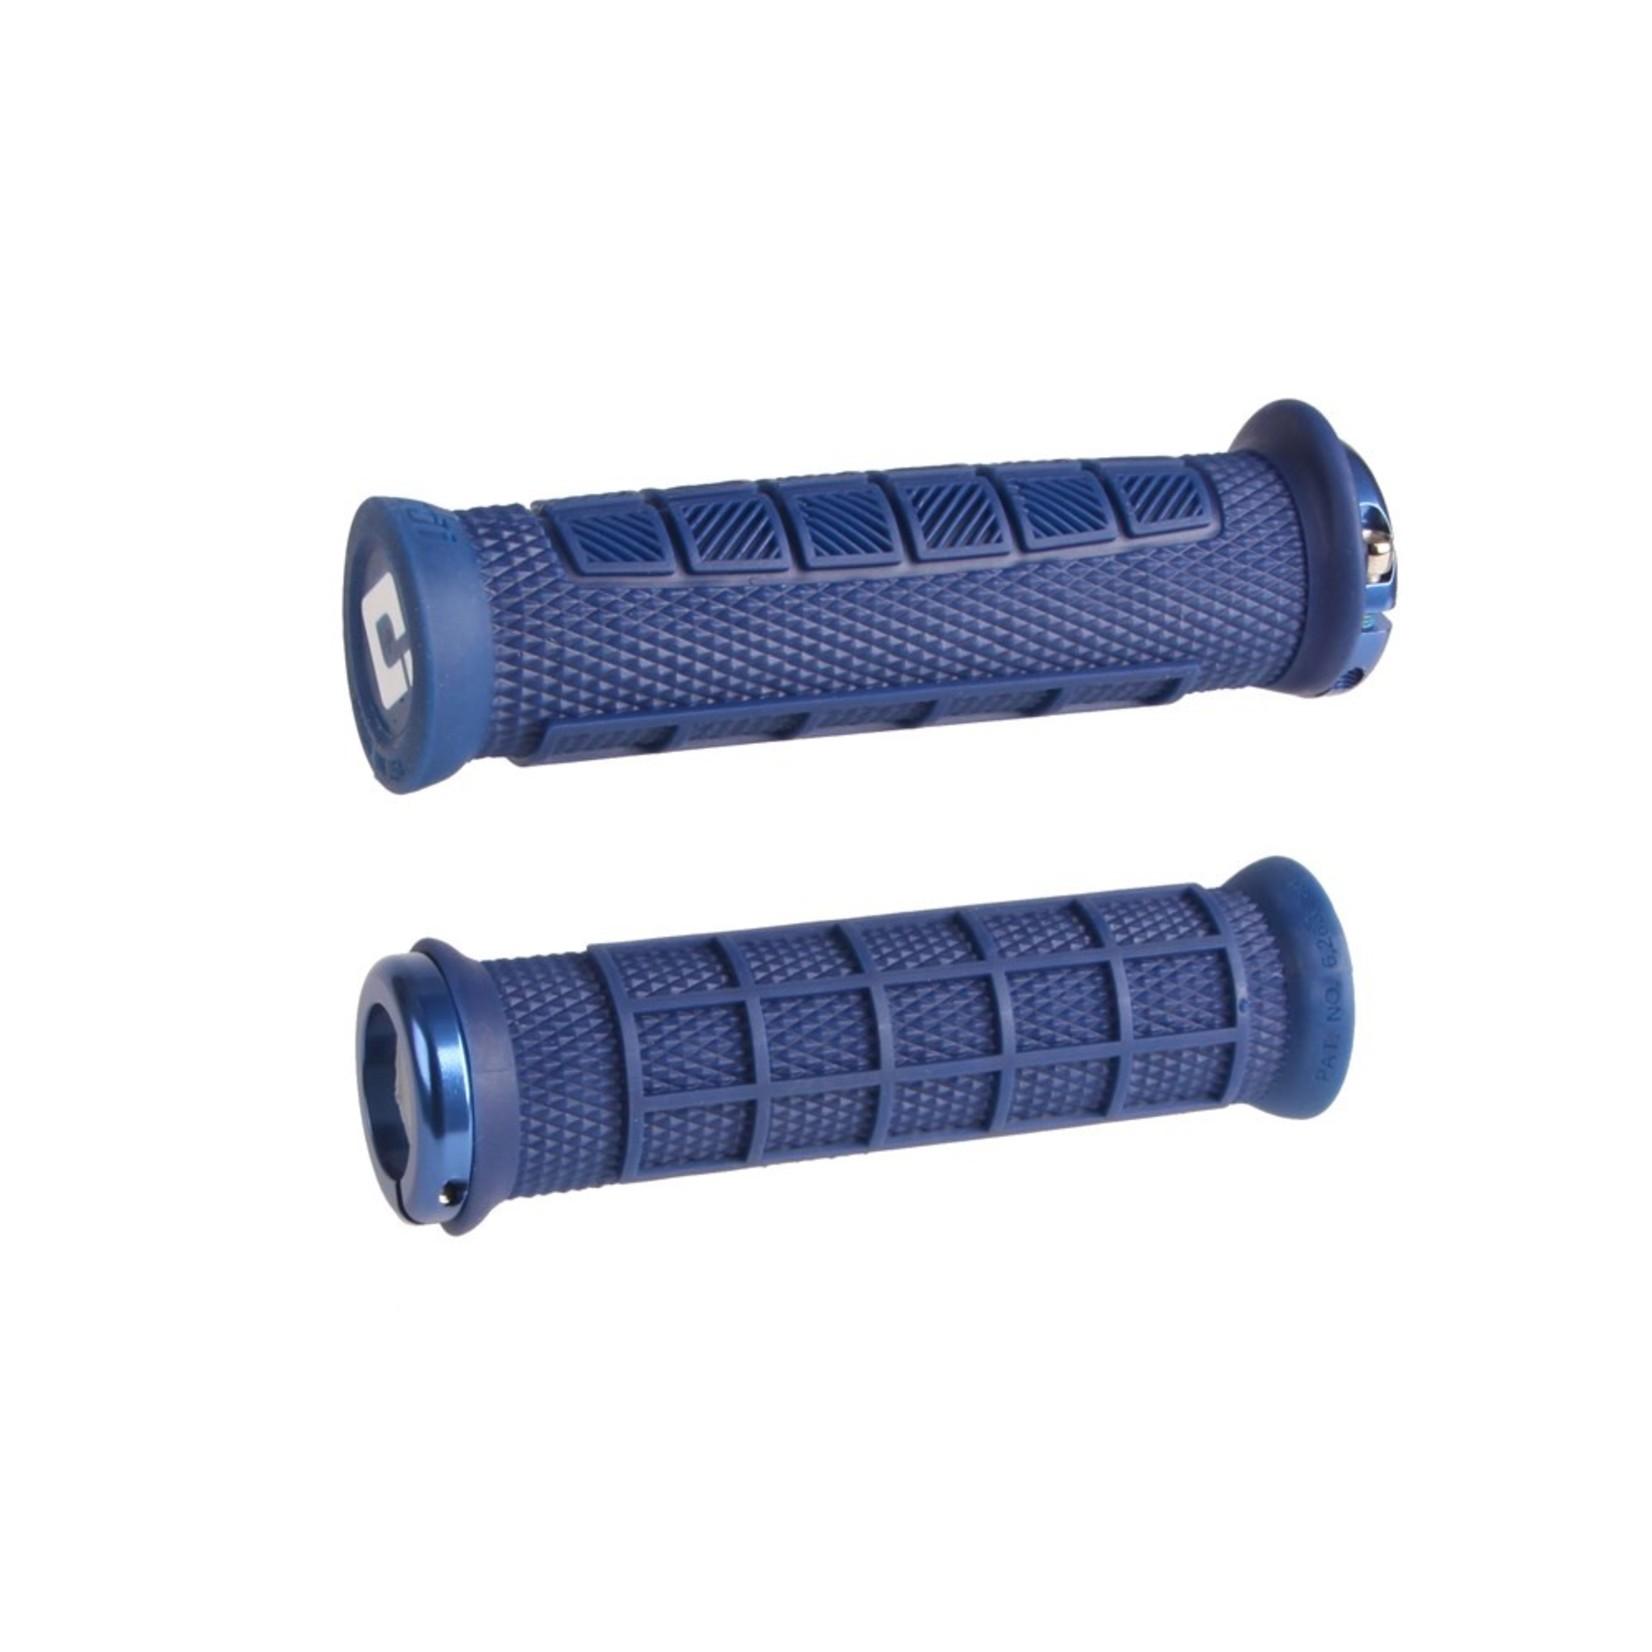 ODI ODI, MTB Elite Pro Lock-On Grip V2.1 135mm